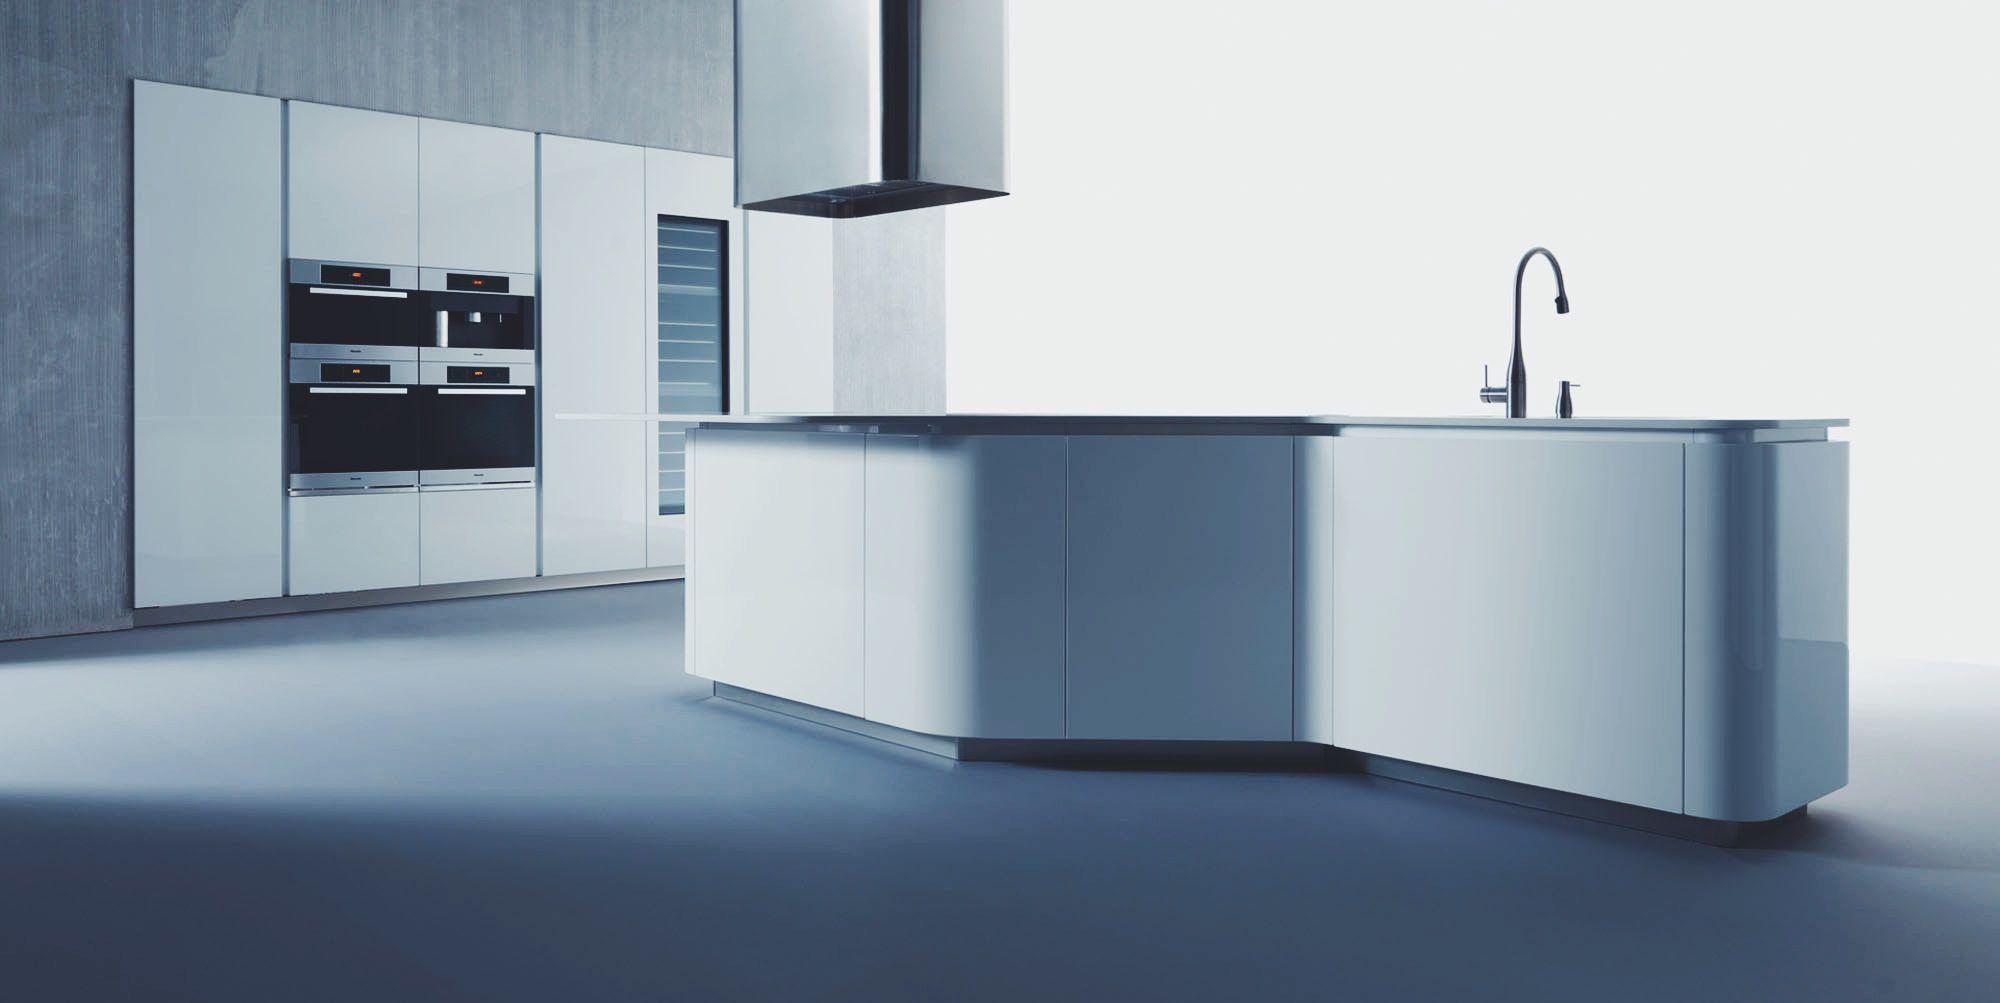 Abitalia South Coast design and install luxury contemporary kitchens ...